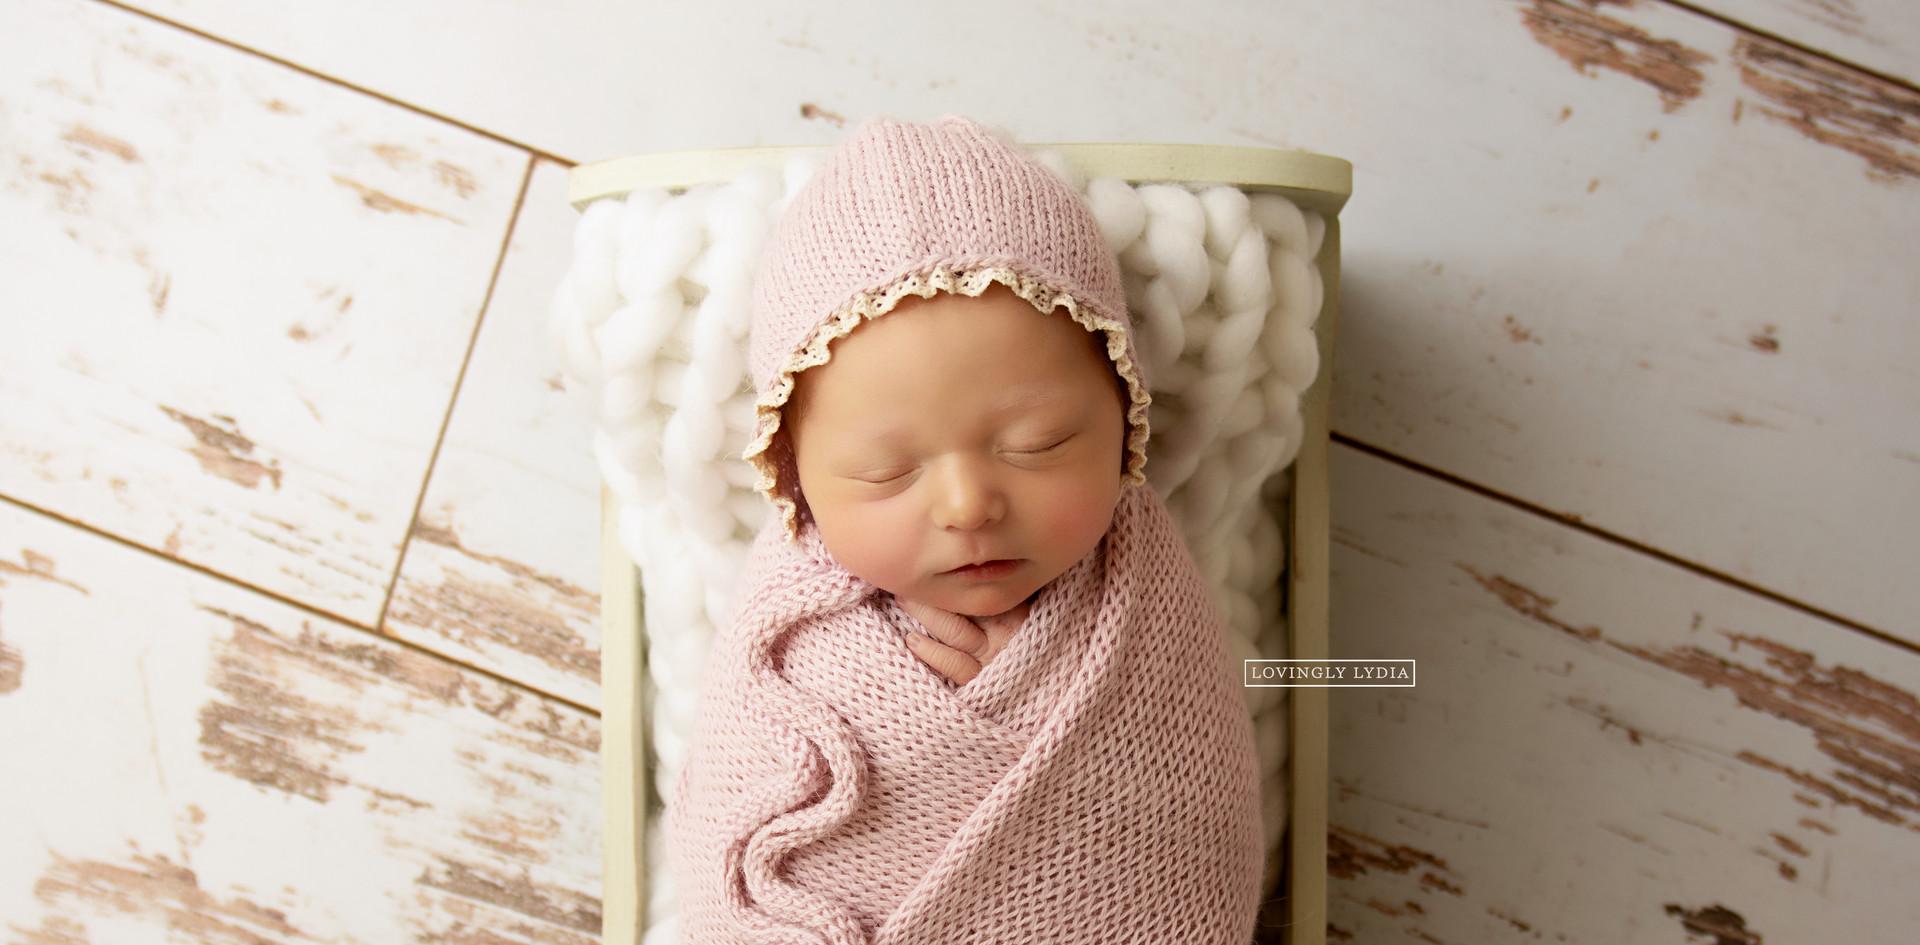 Baby Bed.jpg